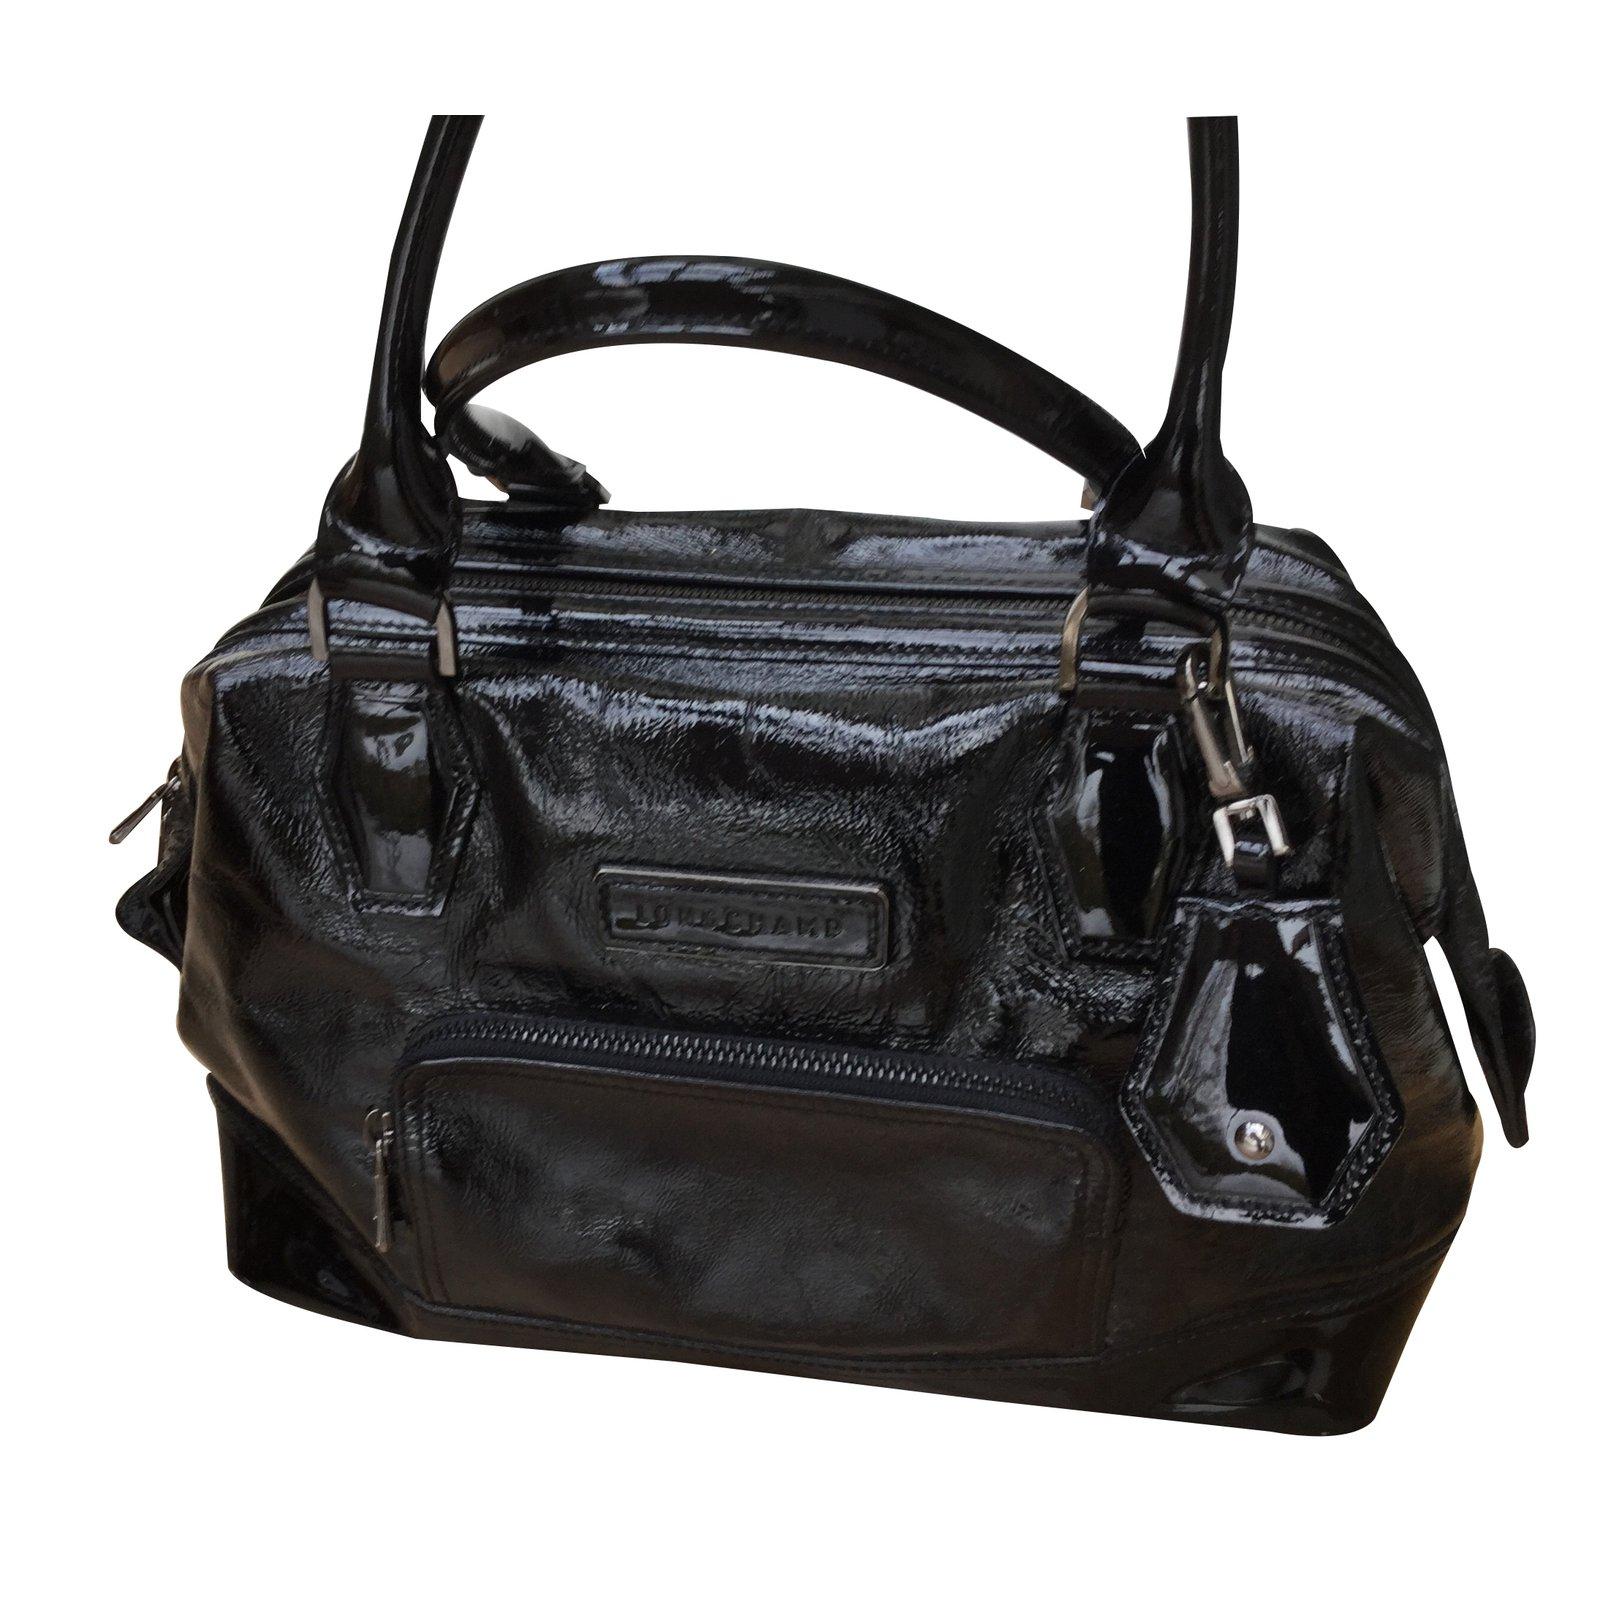 sacs main longchamp legend cuir vernis noir joli closet. Black Bedroom Furniture Sets. Home Design Ideas